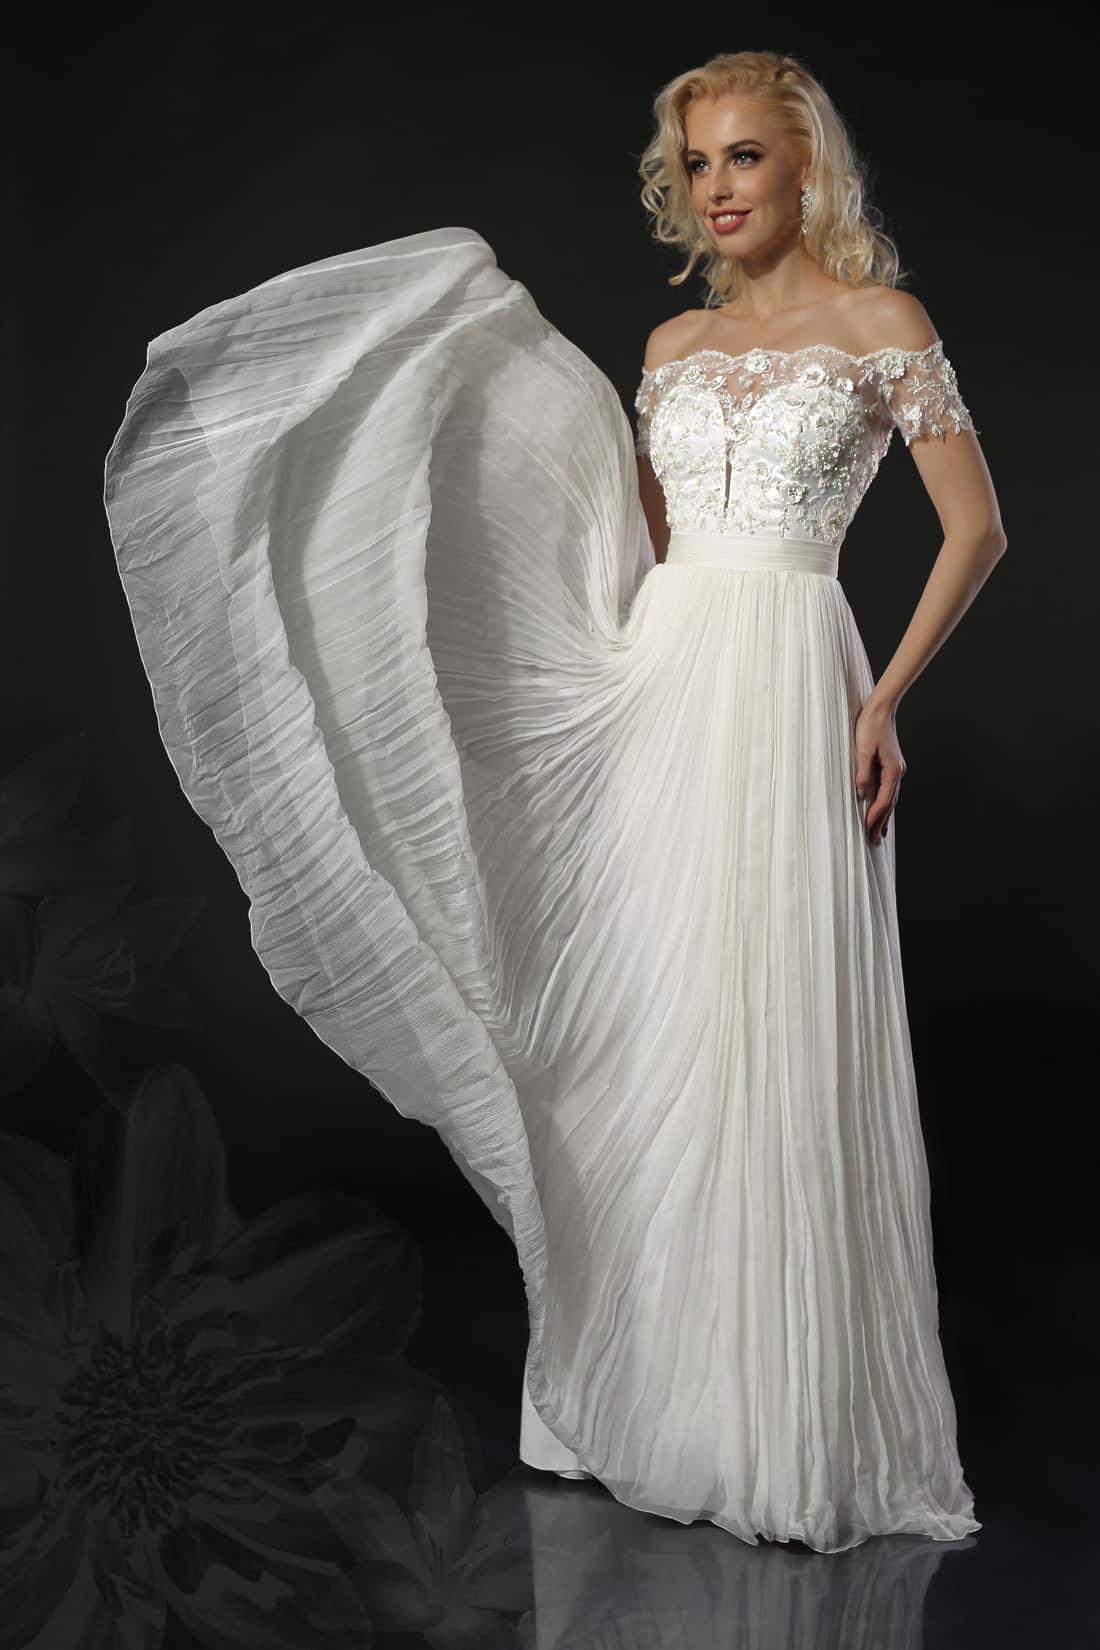 Celeste- Colectia Feeria - Adora Sposa (4)